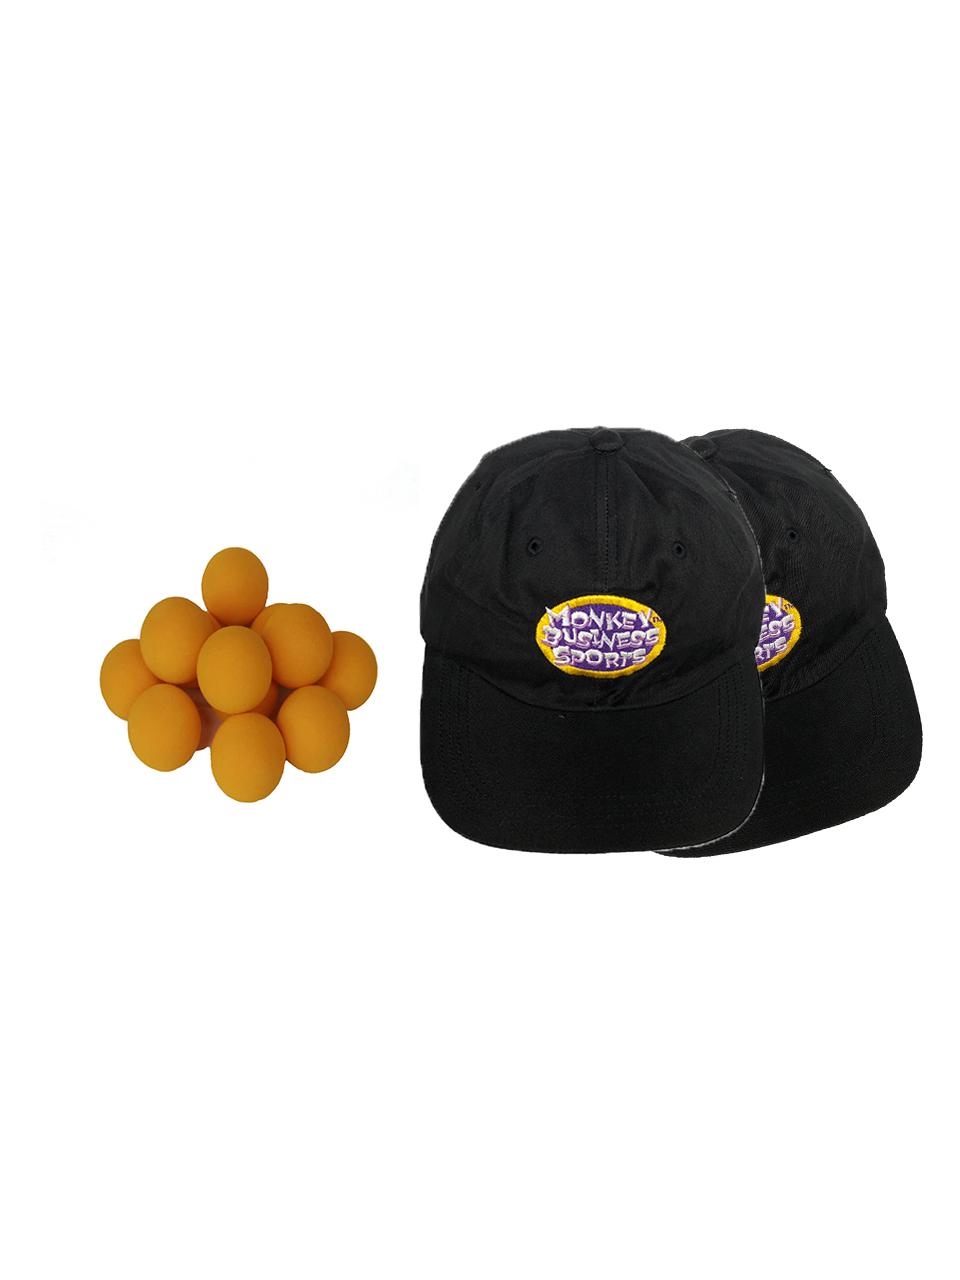 Hat + Balls.jpg